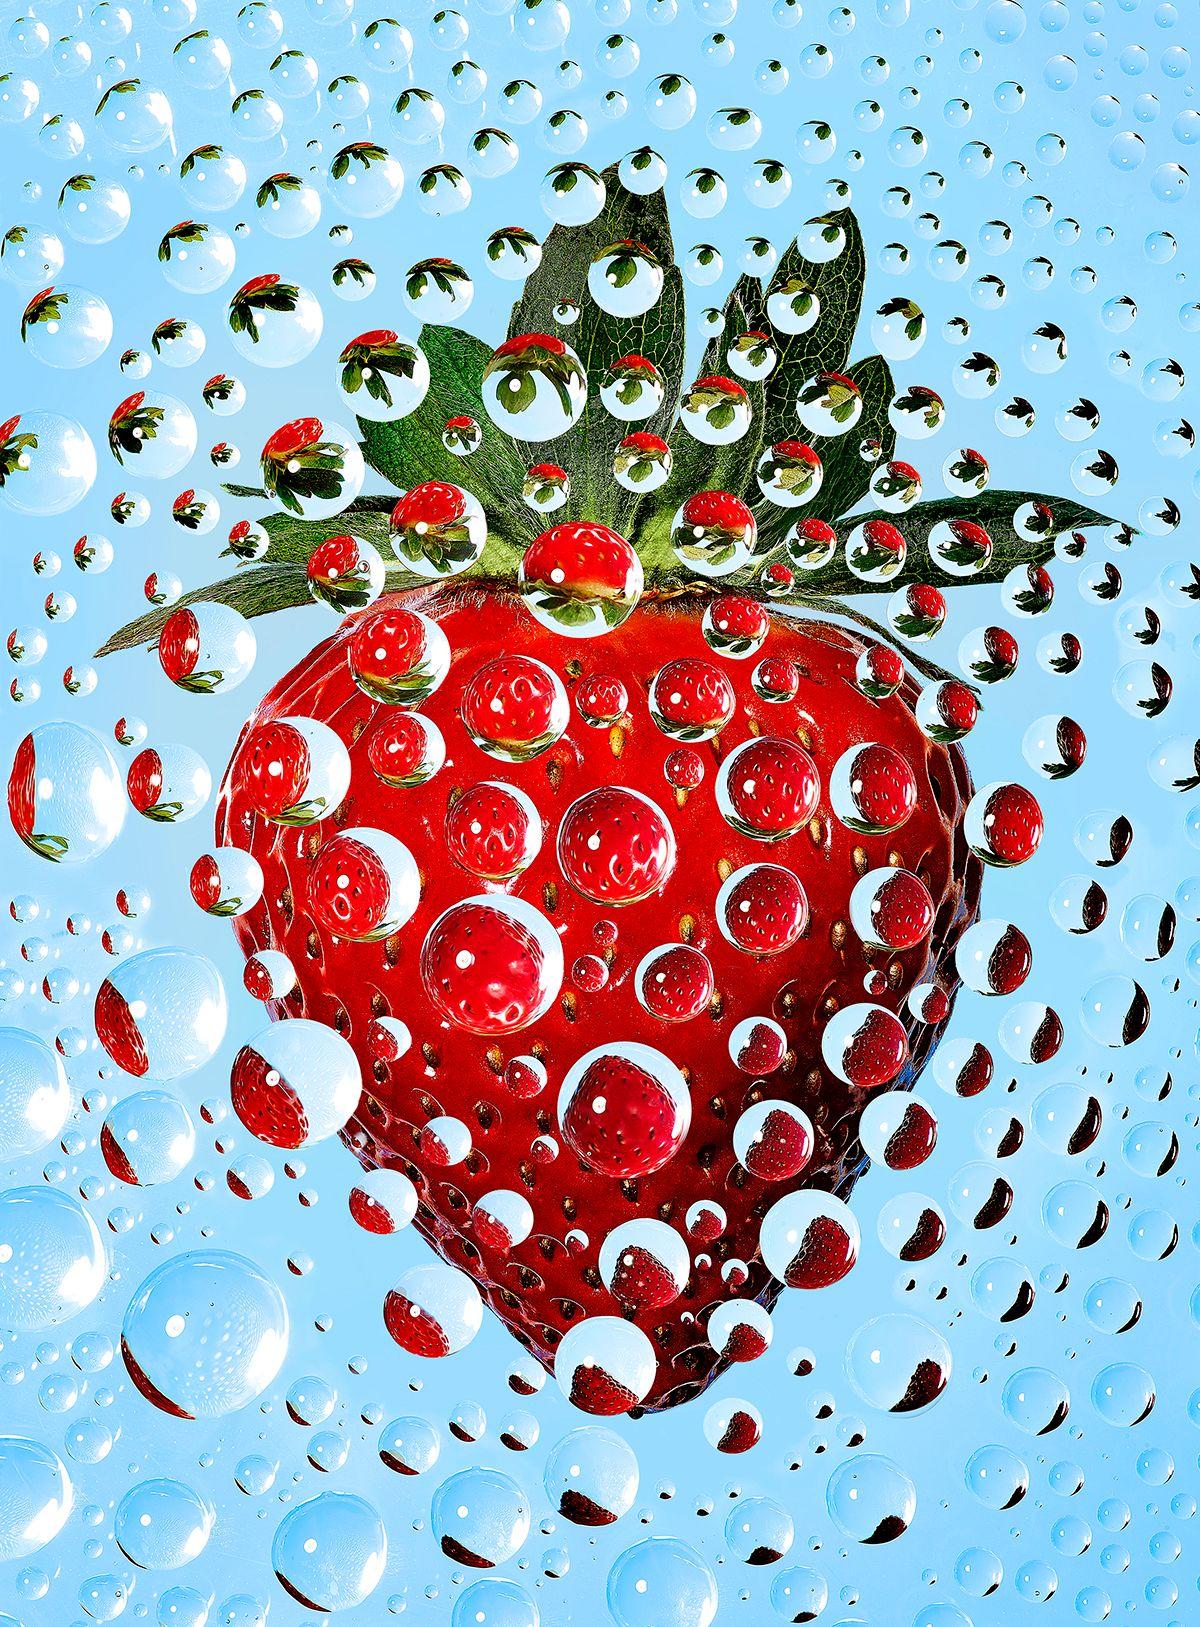 strawberry_flower_droplets_02_4x5.jpg